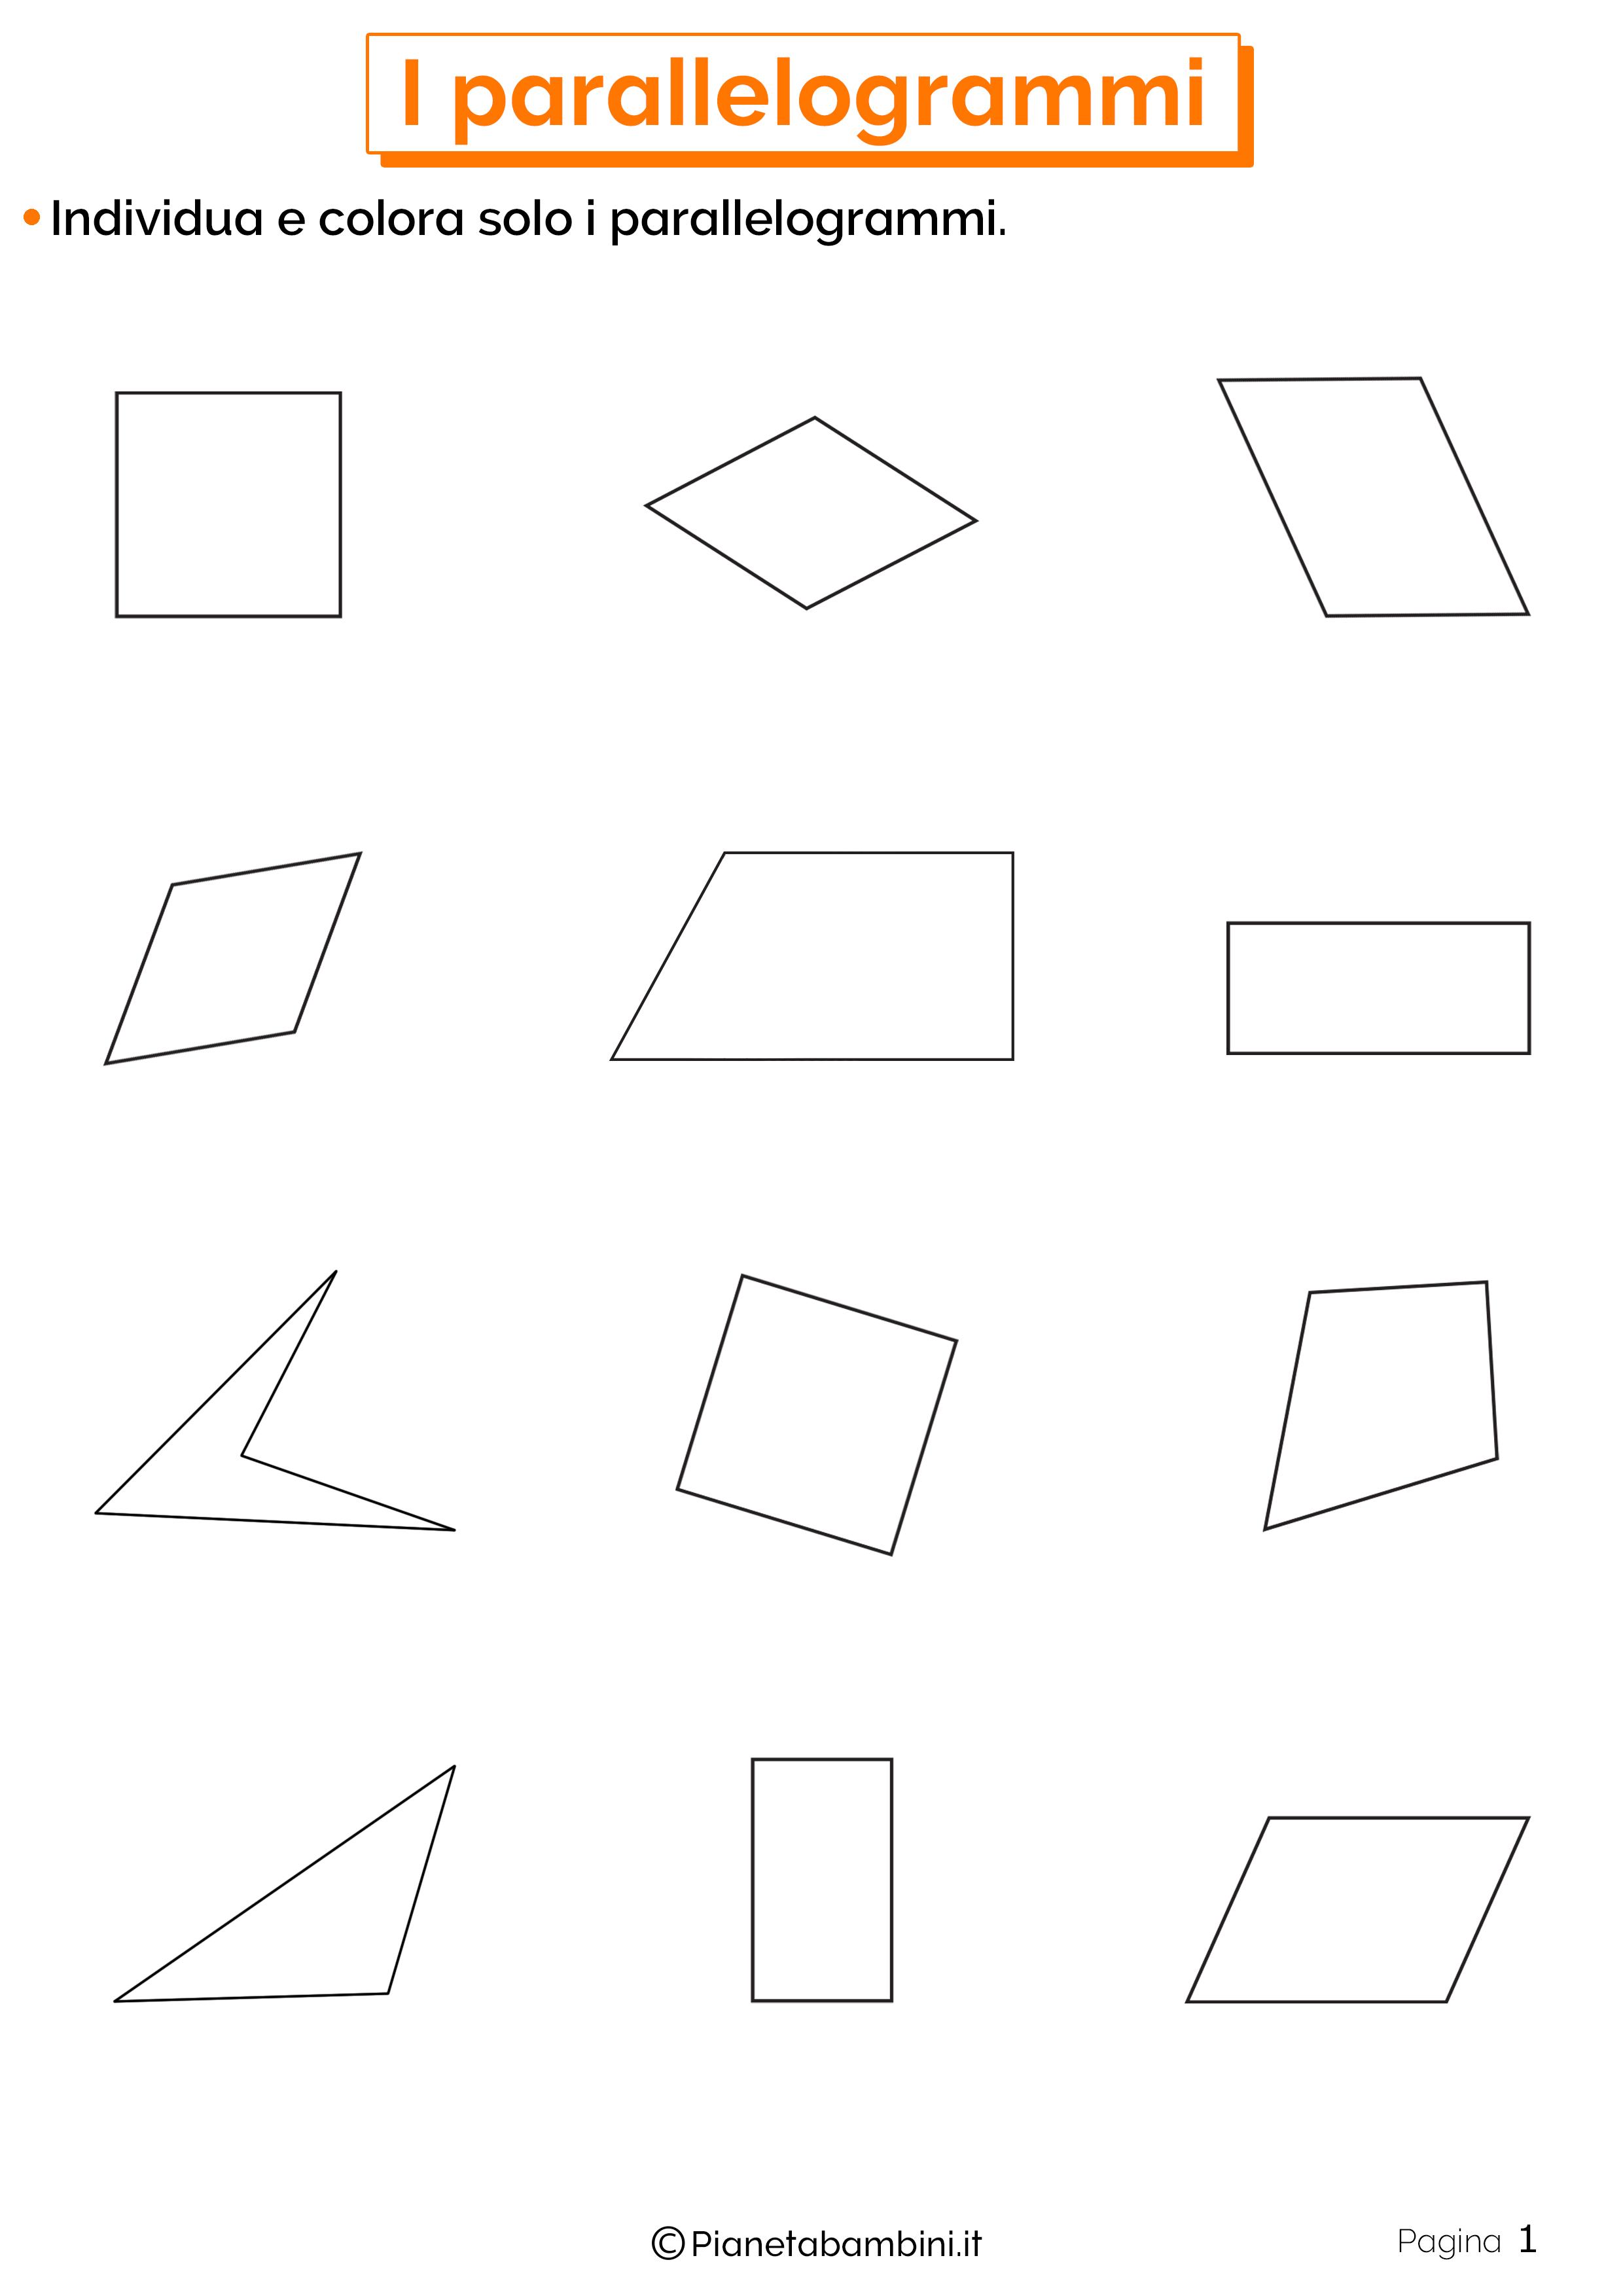 Schede didattiche sui parallelogrammi 1